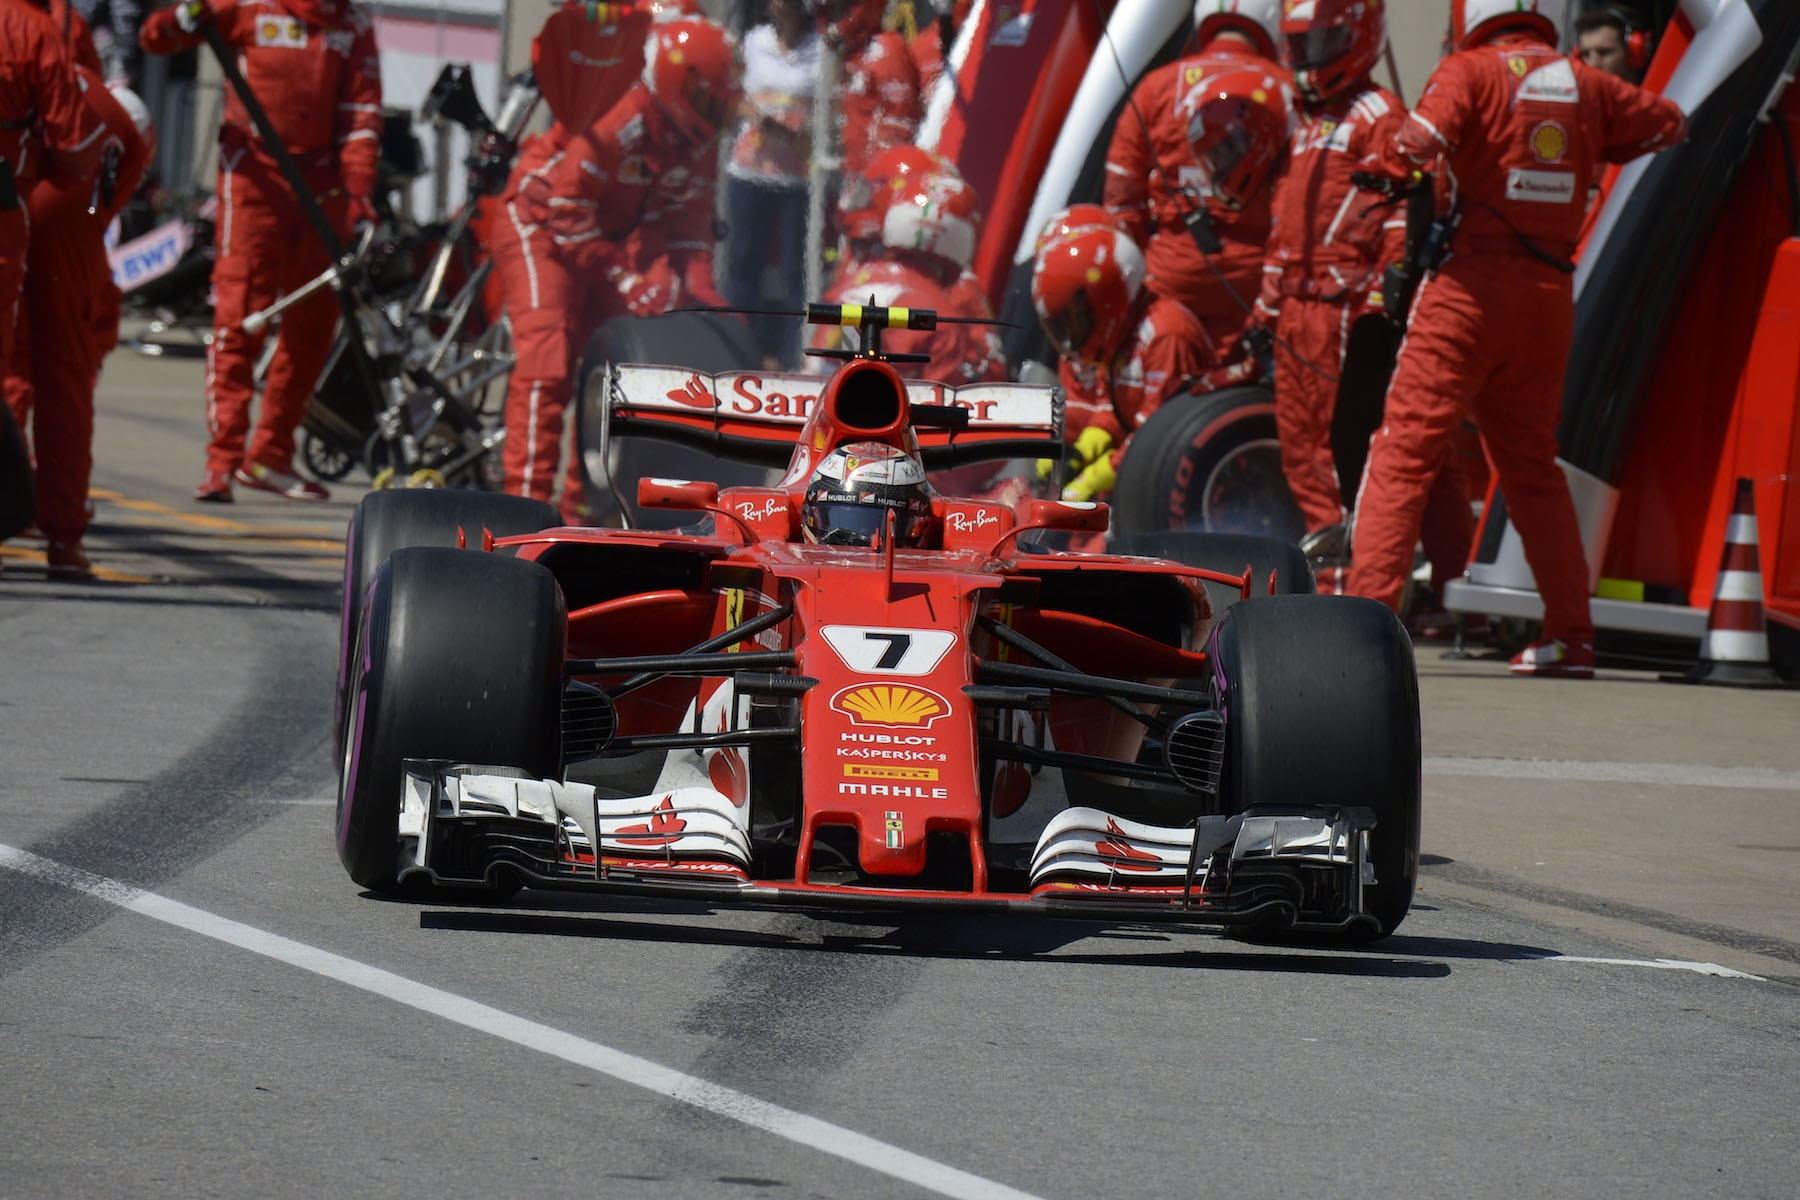 G 2017 Kimi Raikkonen | Ferrari SF70H | 2017 Canadian GP P7 2 copy.jpg